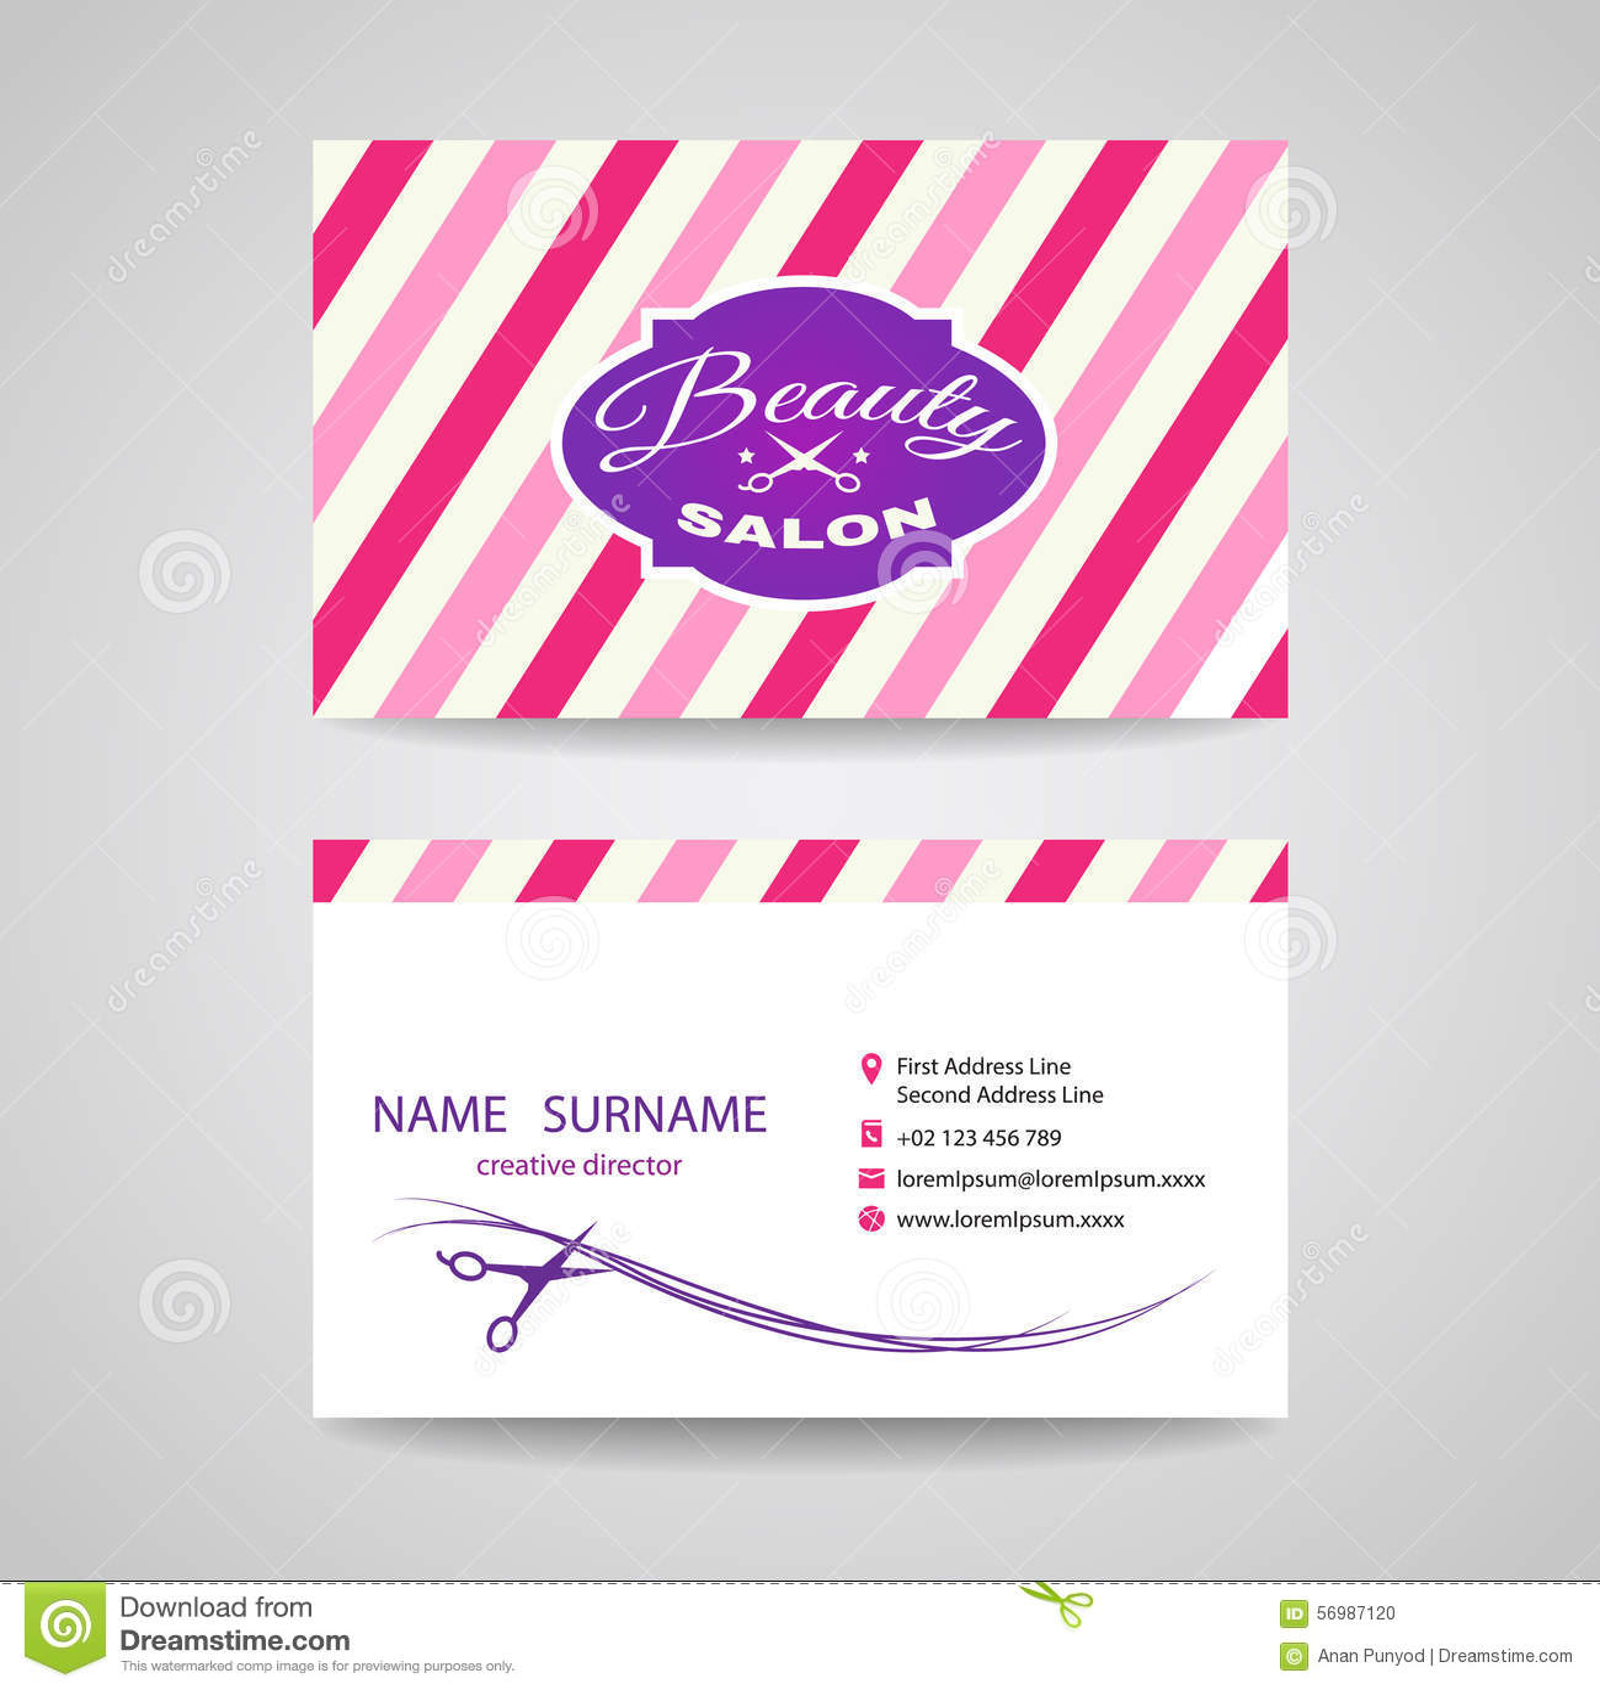 Business Card Beauty Salon - Pink Tone Vector Design Illustration ...